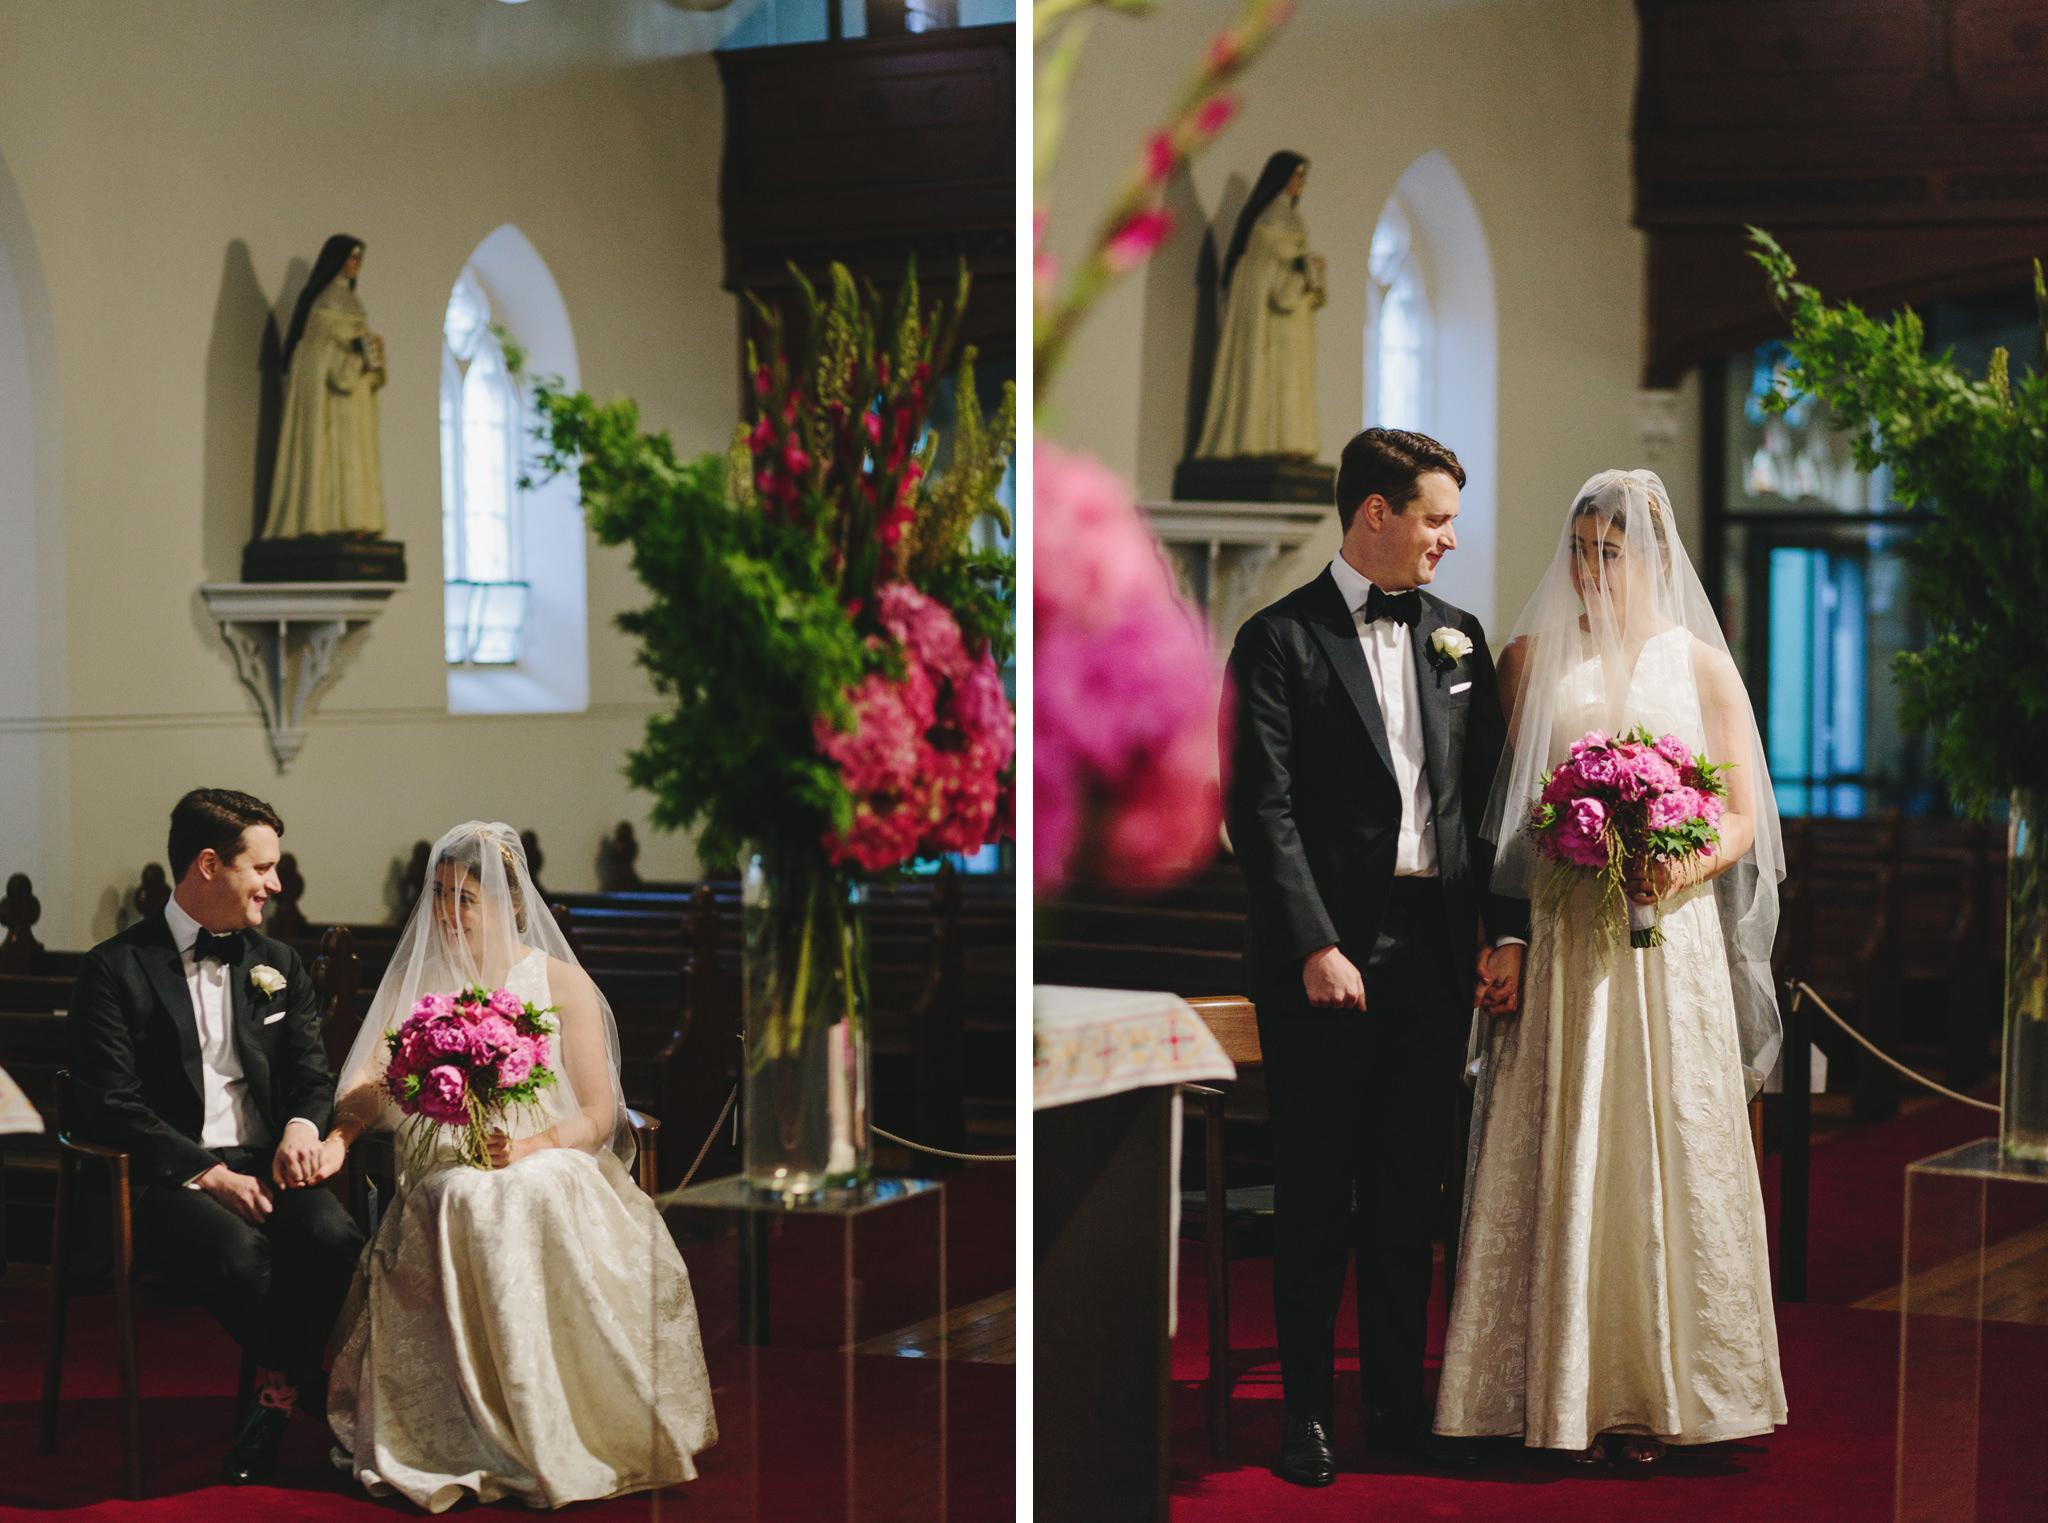 Abbotsford_Convent_Wedding_Peter_Anna054.JPG